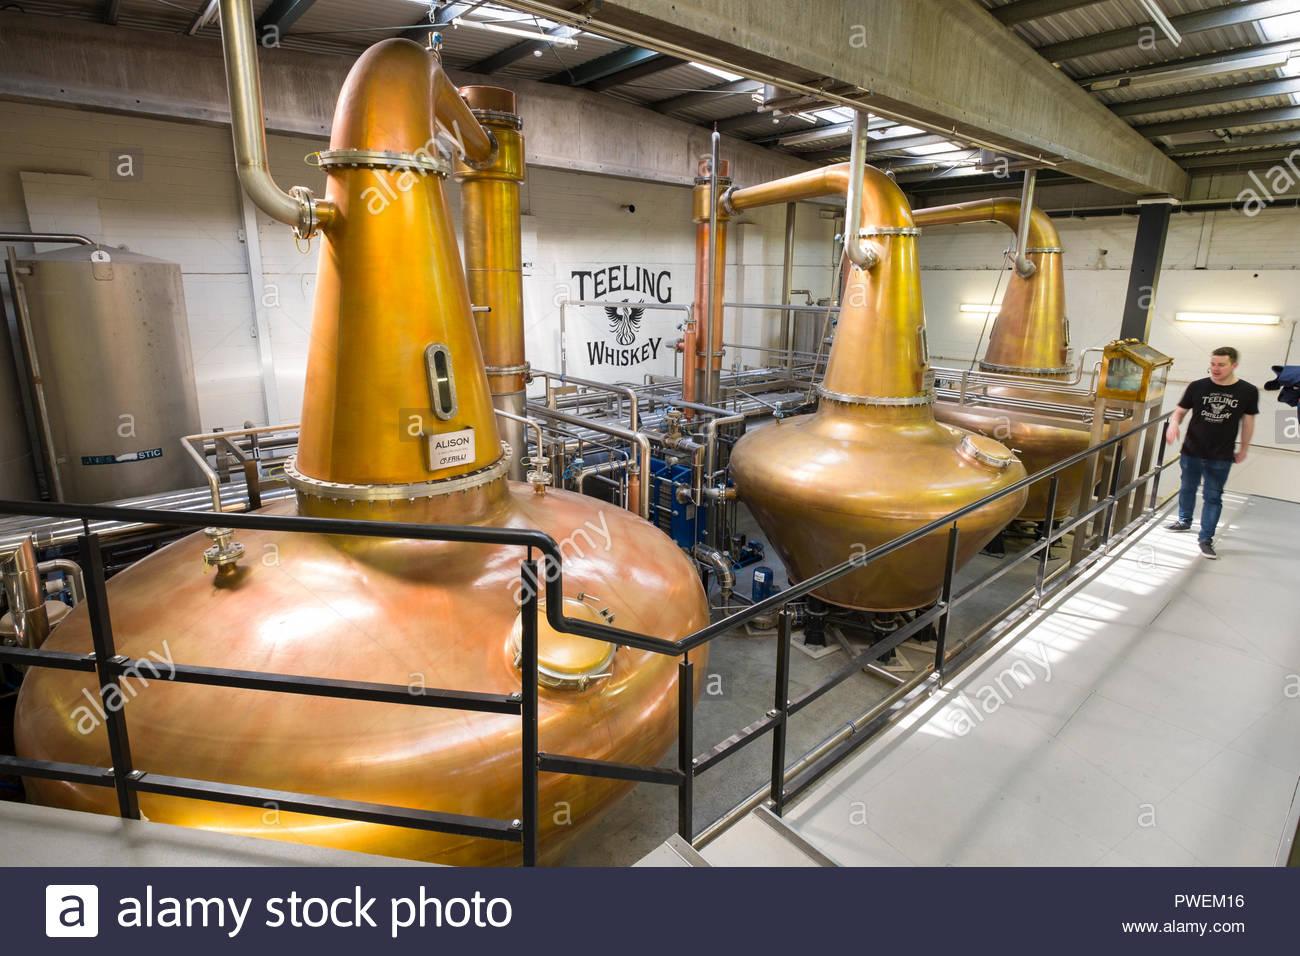 Hand crafted copper pot stills inside the Teeling Distillery, Newmarket, The Liberties, Dublin, Leinster, Ireland - Stock Image